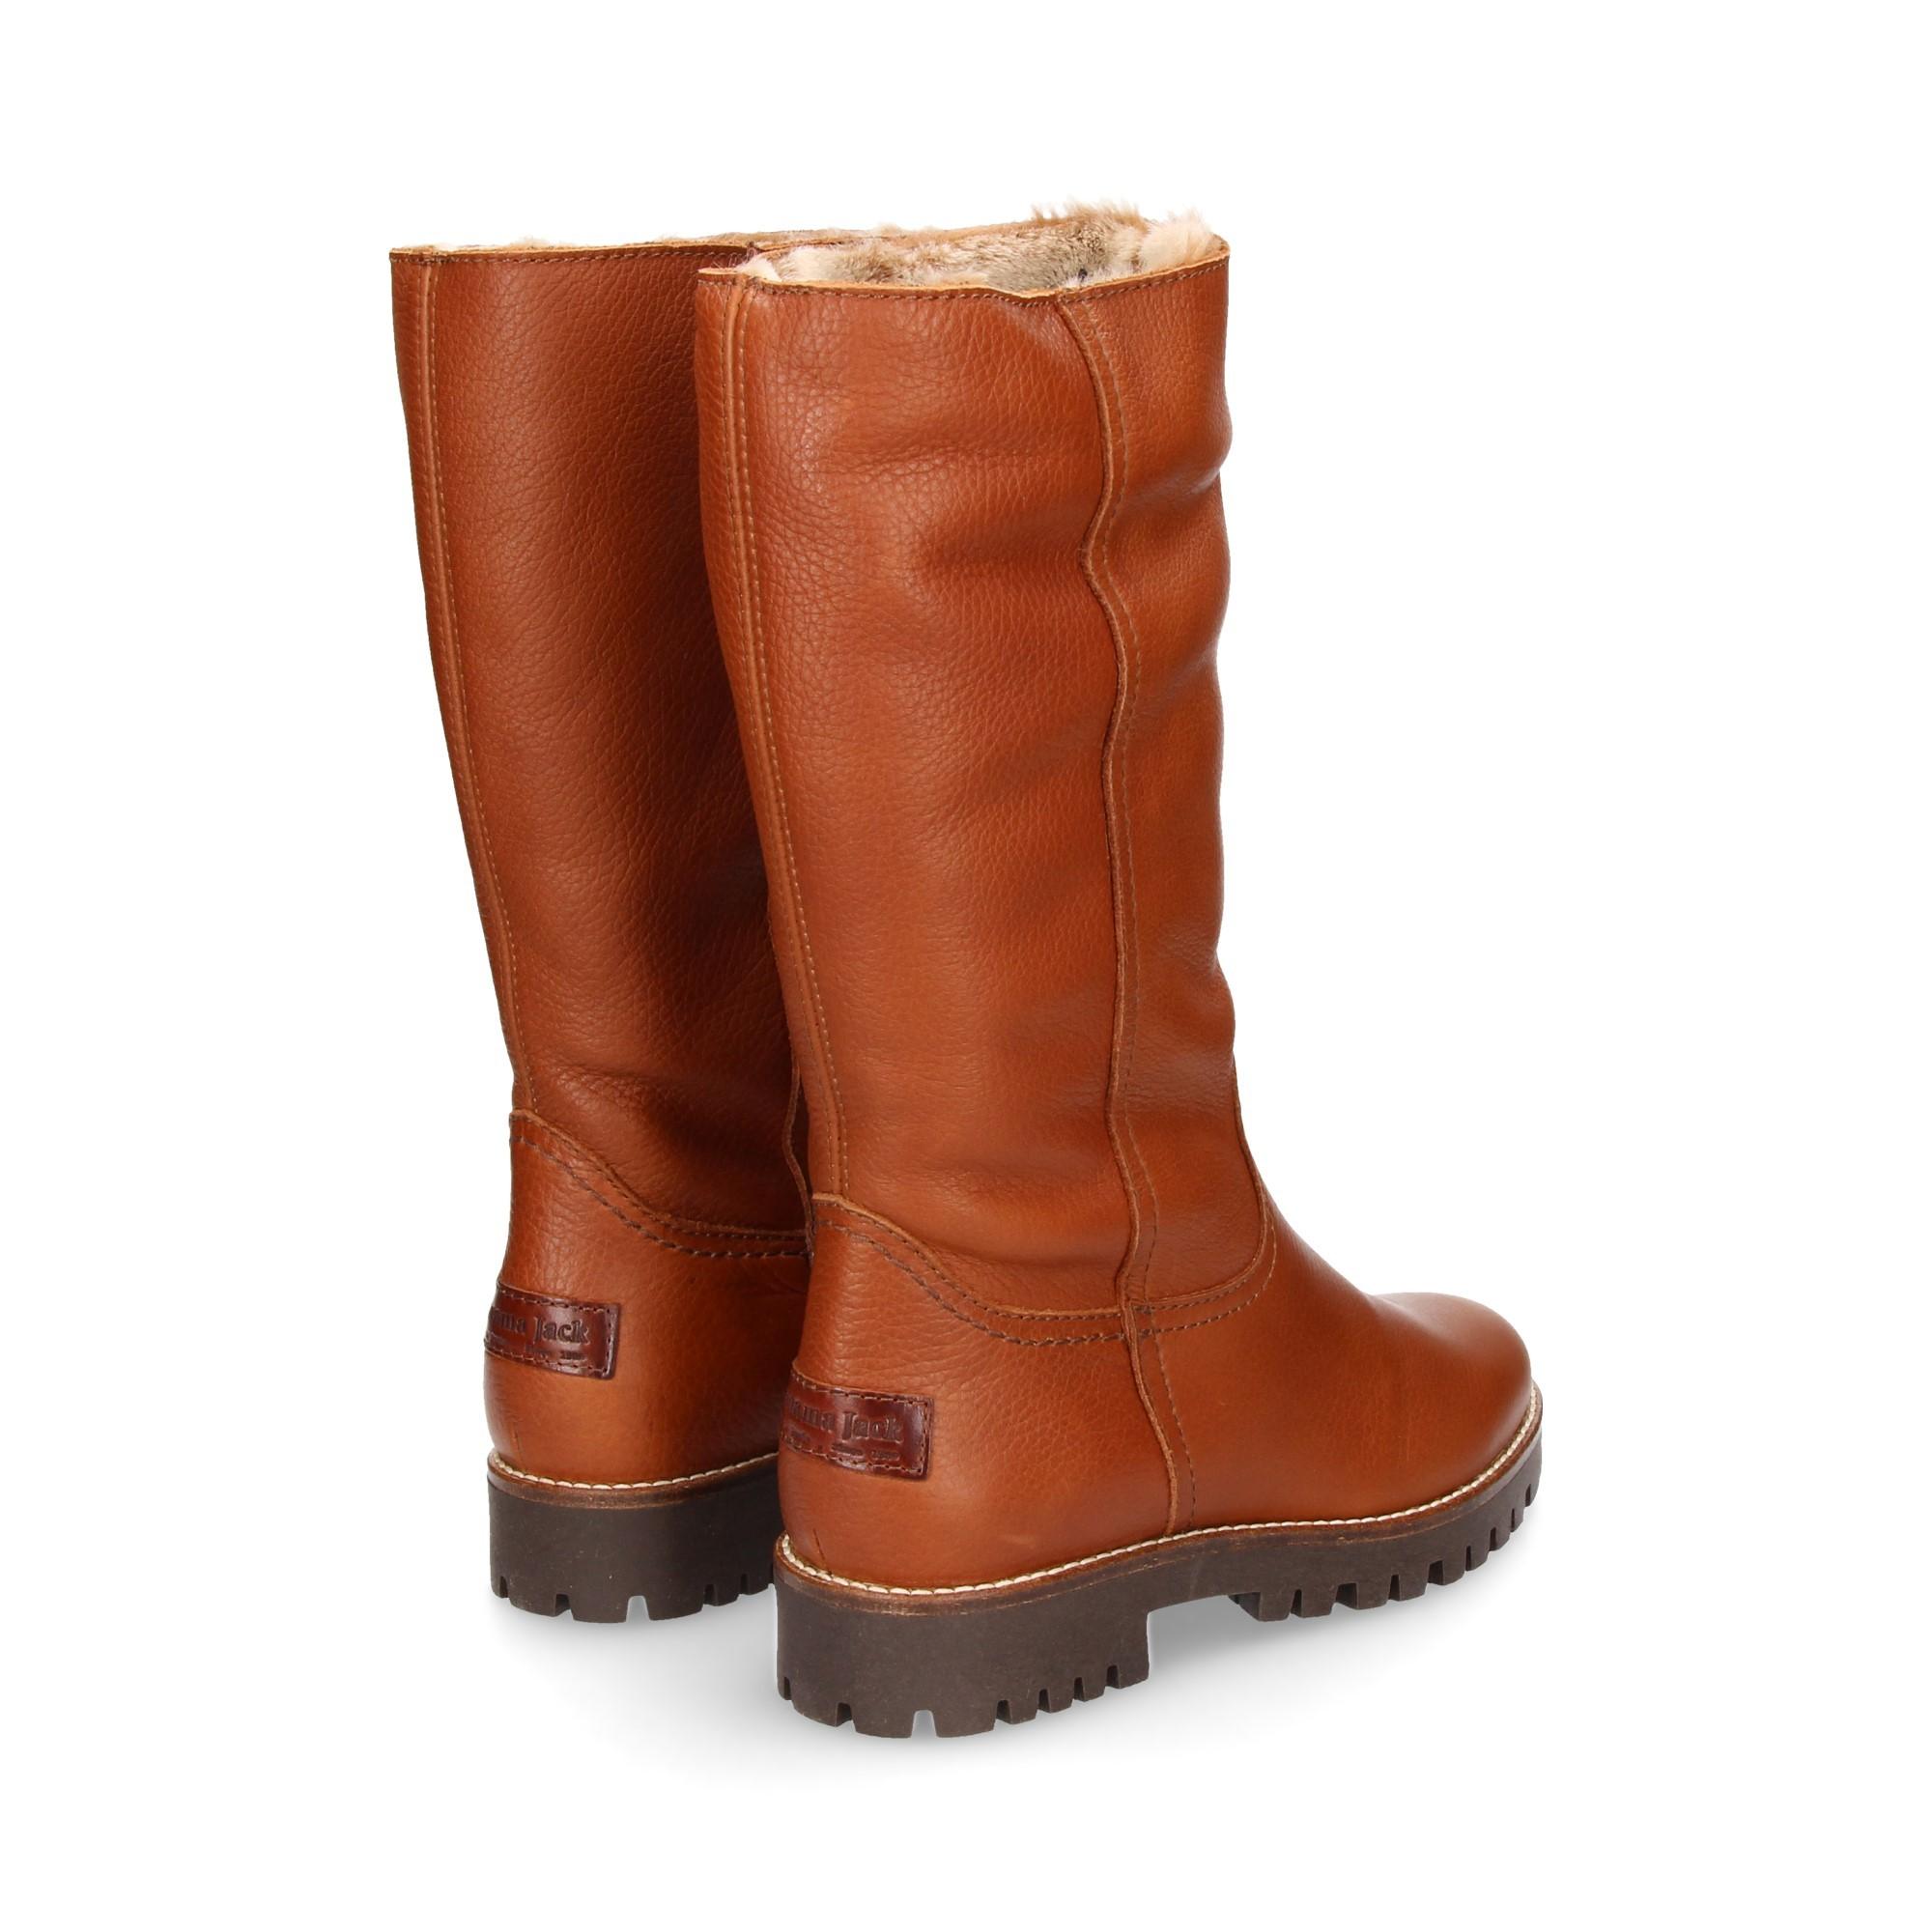 76da3a5c4efc68 PANAMA JACK Women s flat boots TANIA B22 CUERO